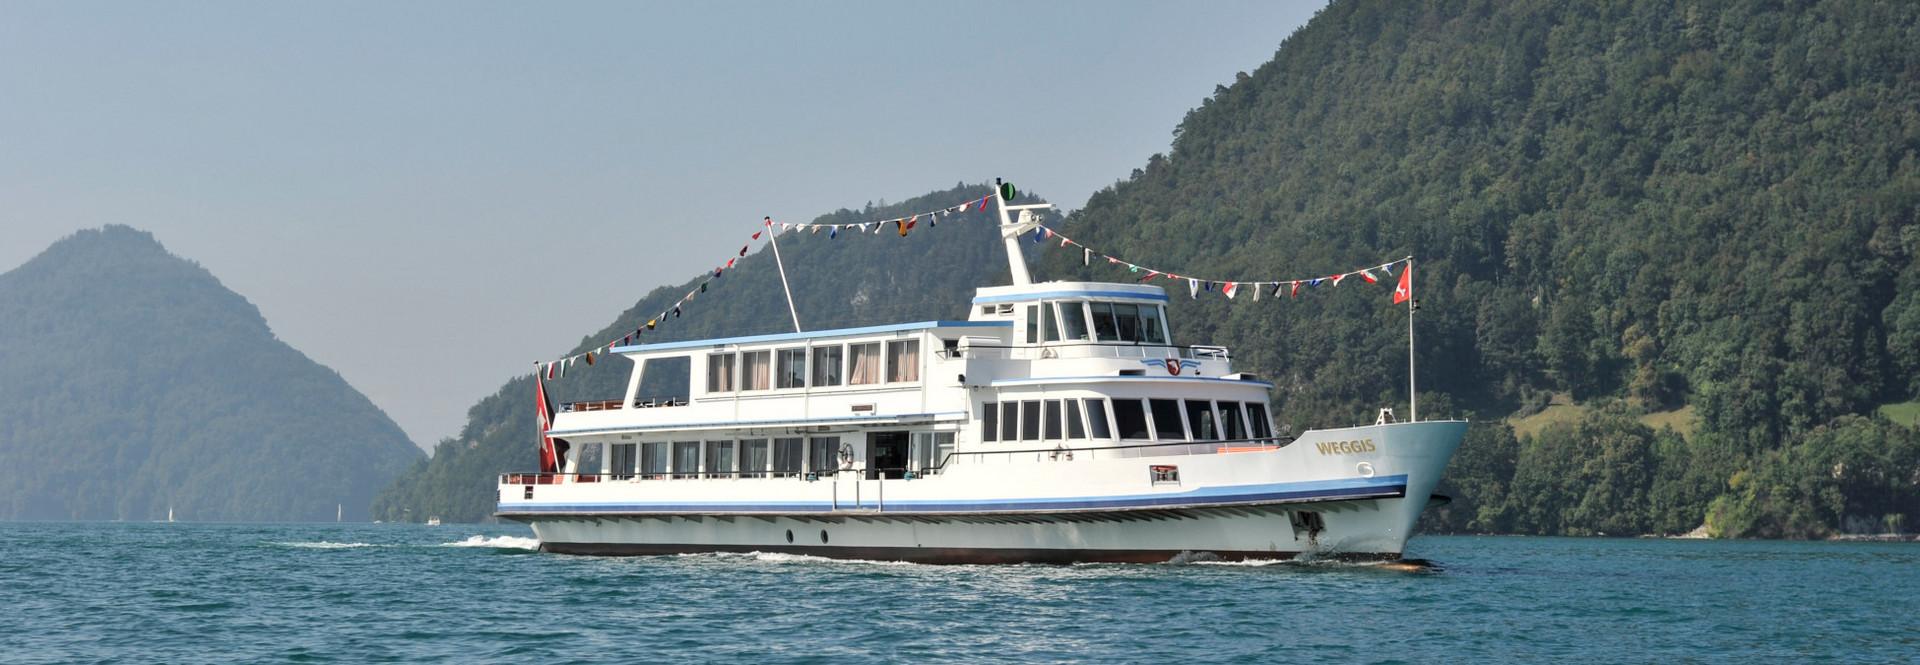 The motor vessel Weggis cruises on Lake Lucerne in sunny weather.